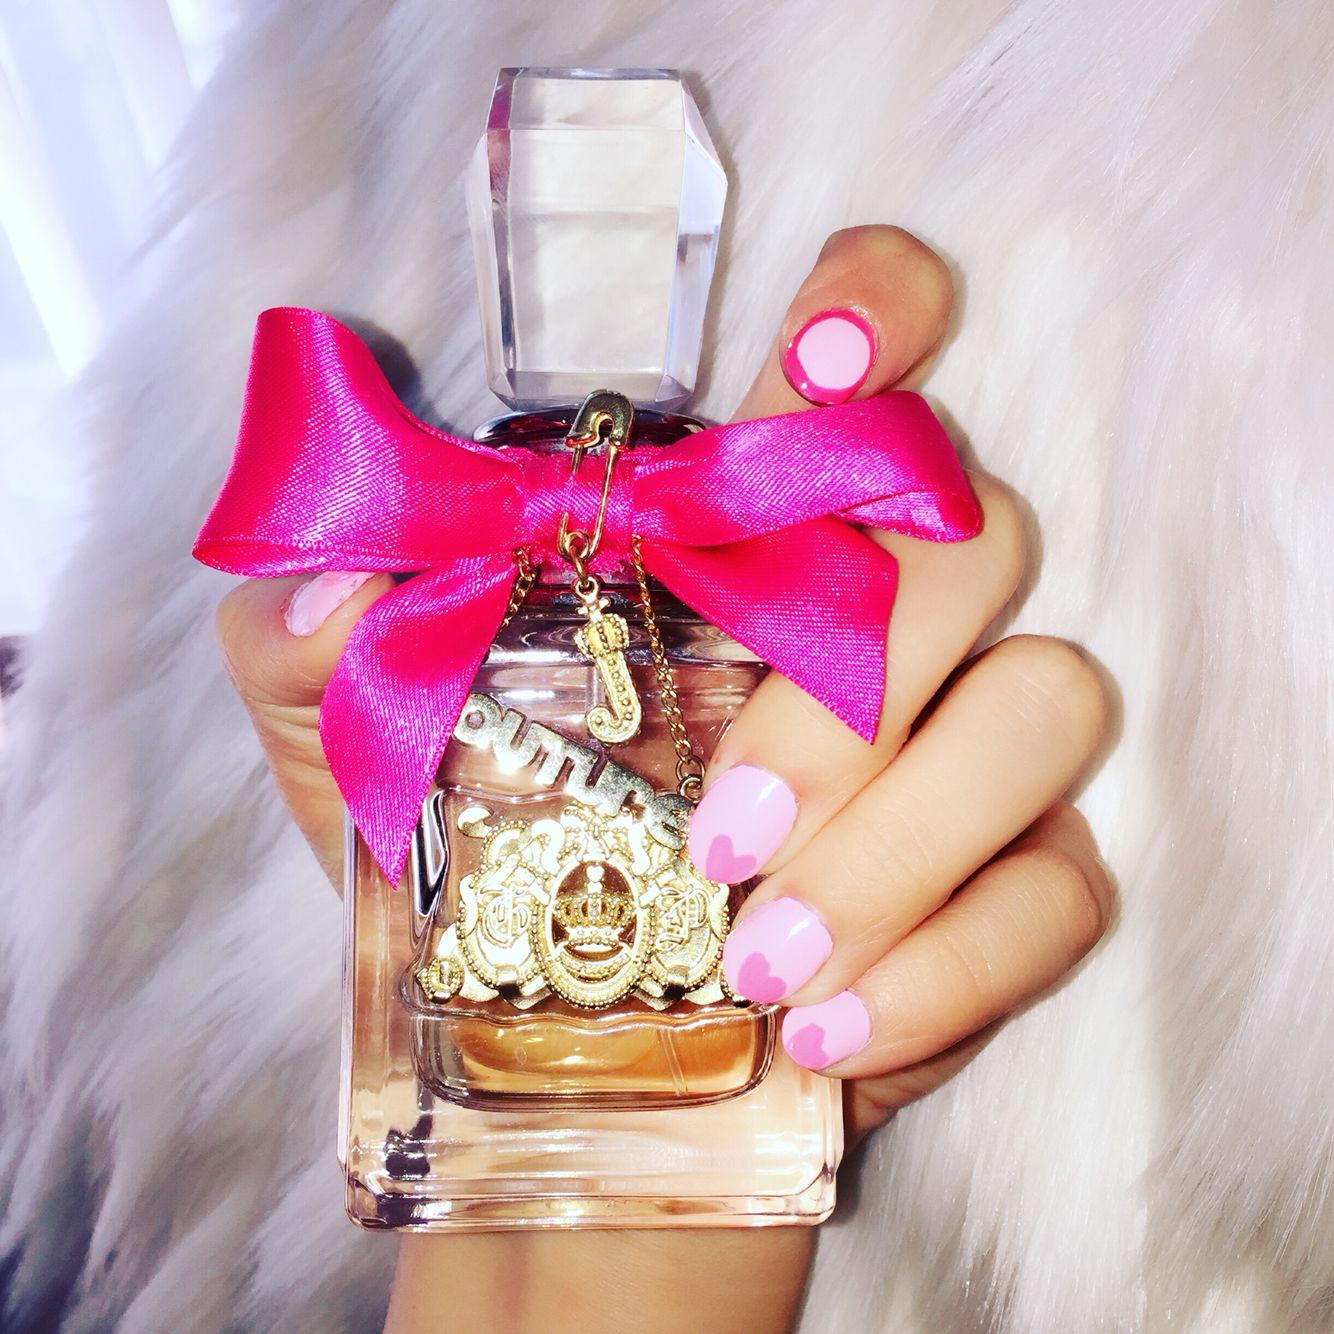 Barbie's Manicure #ValentinesNails #Pink